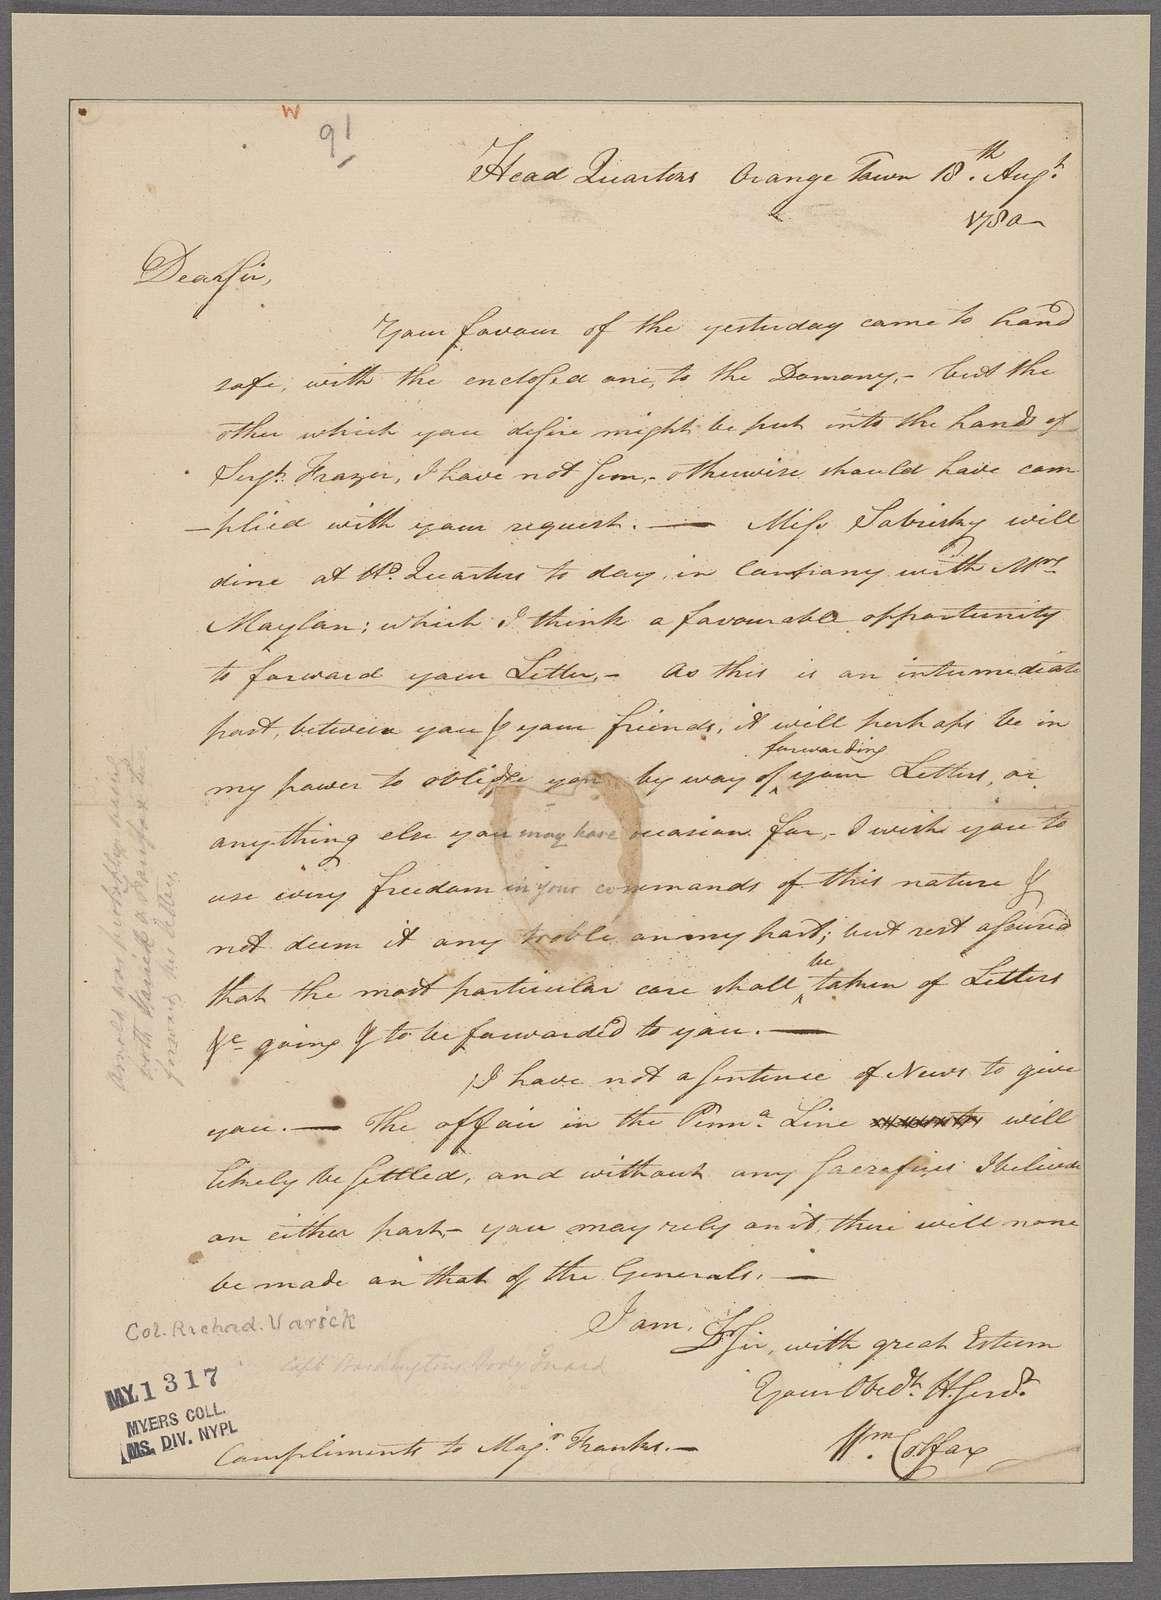 Colfax, William. Headquarters, Orangetown. To [Colonel Richard Varick]